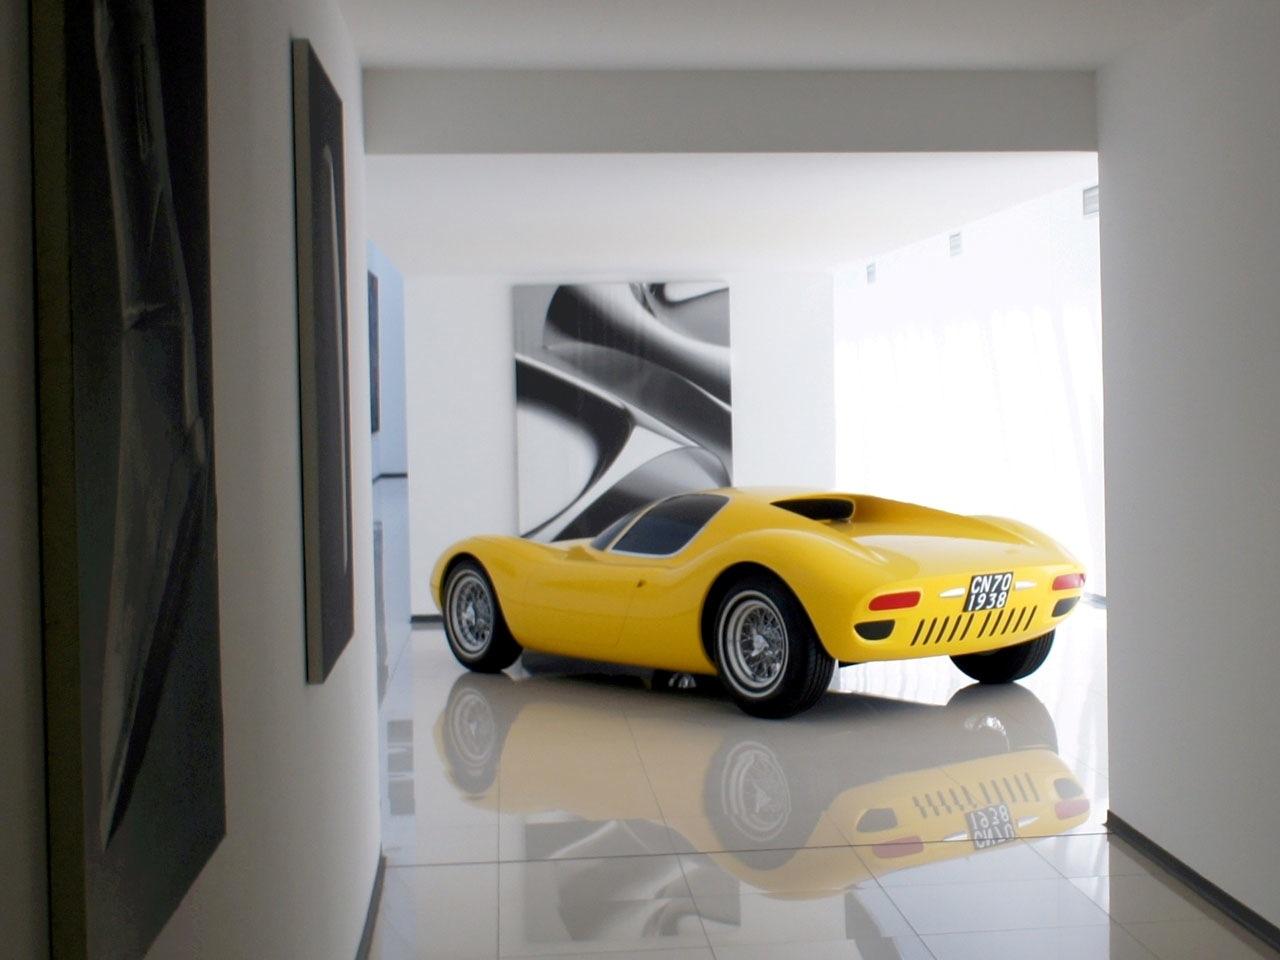 First Lamborghini by Giugiaro